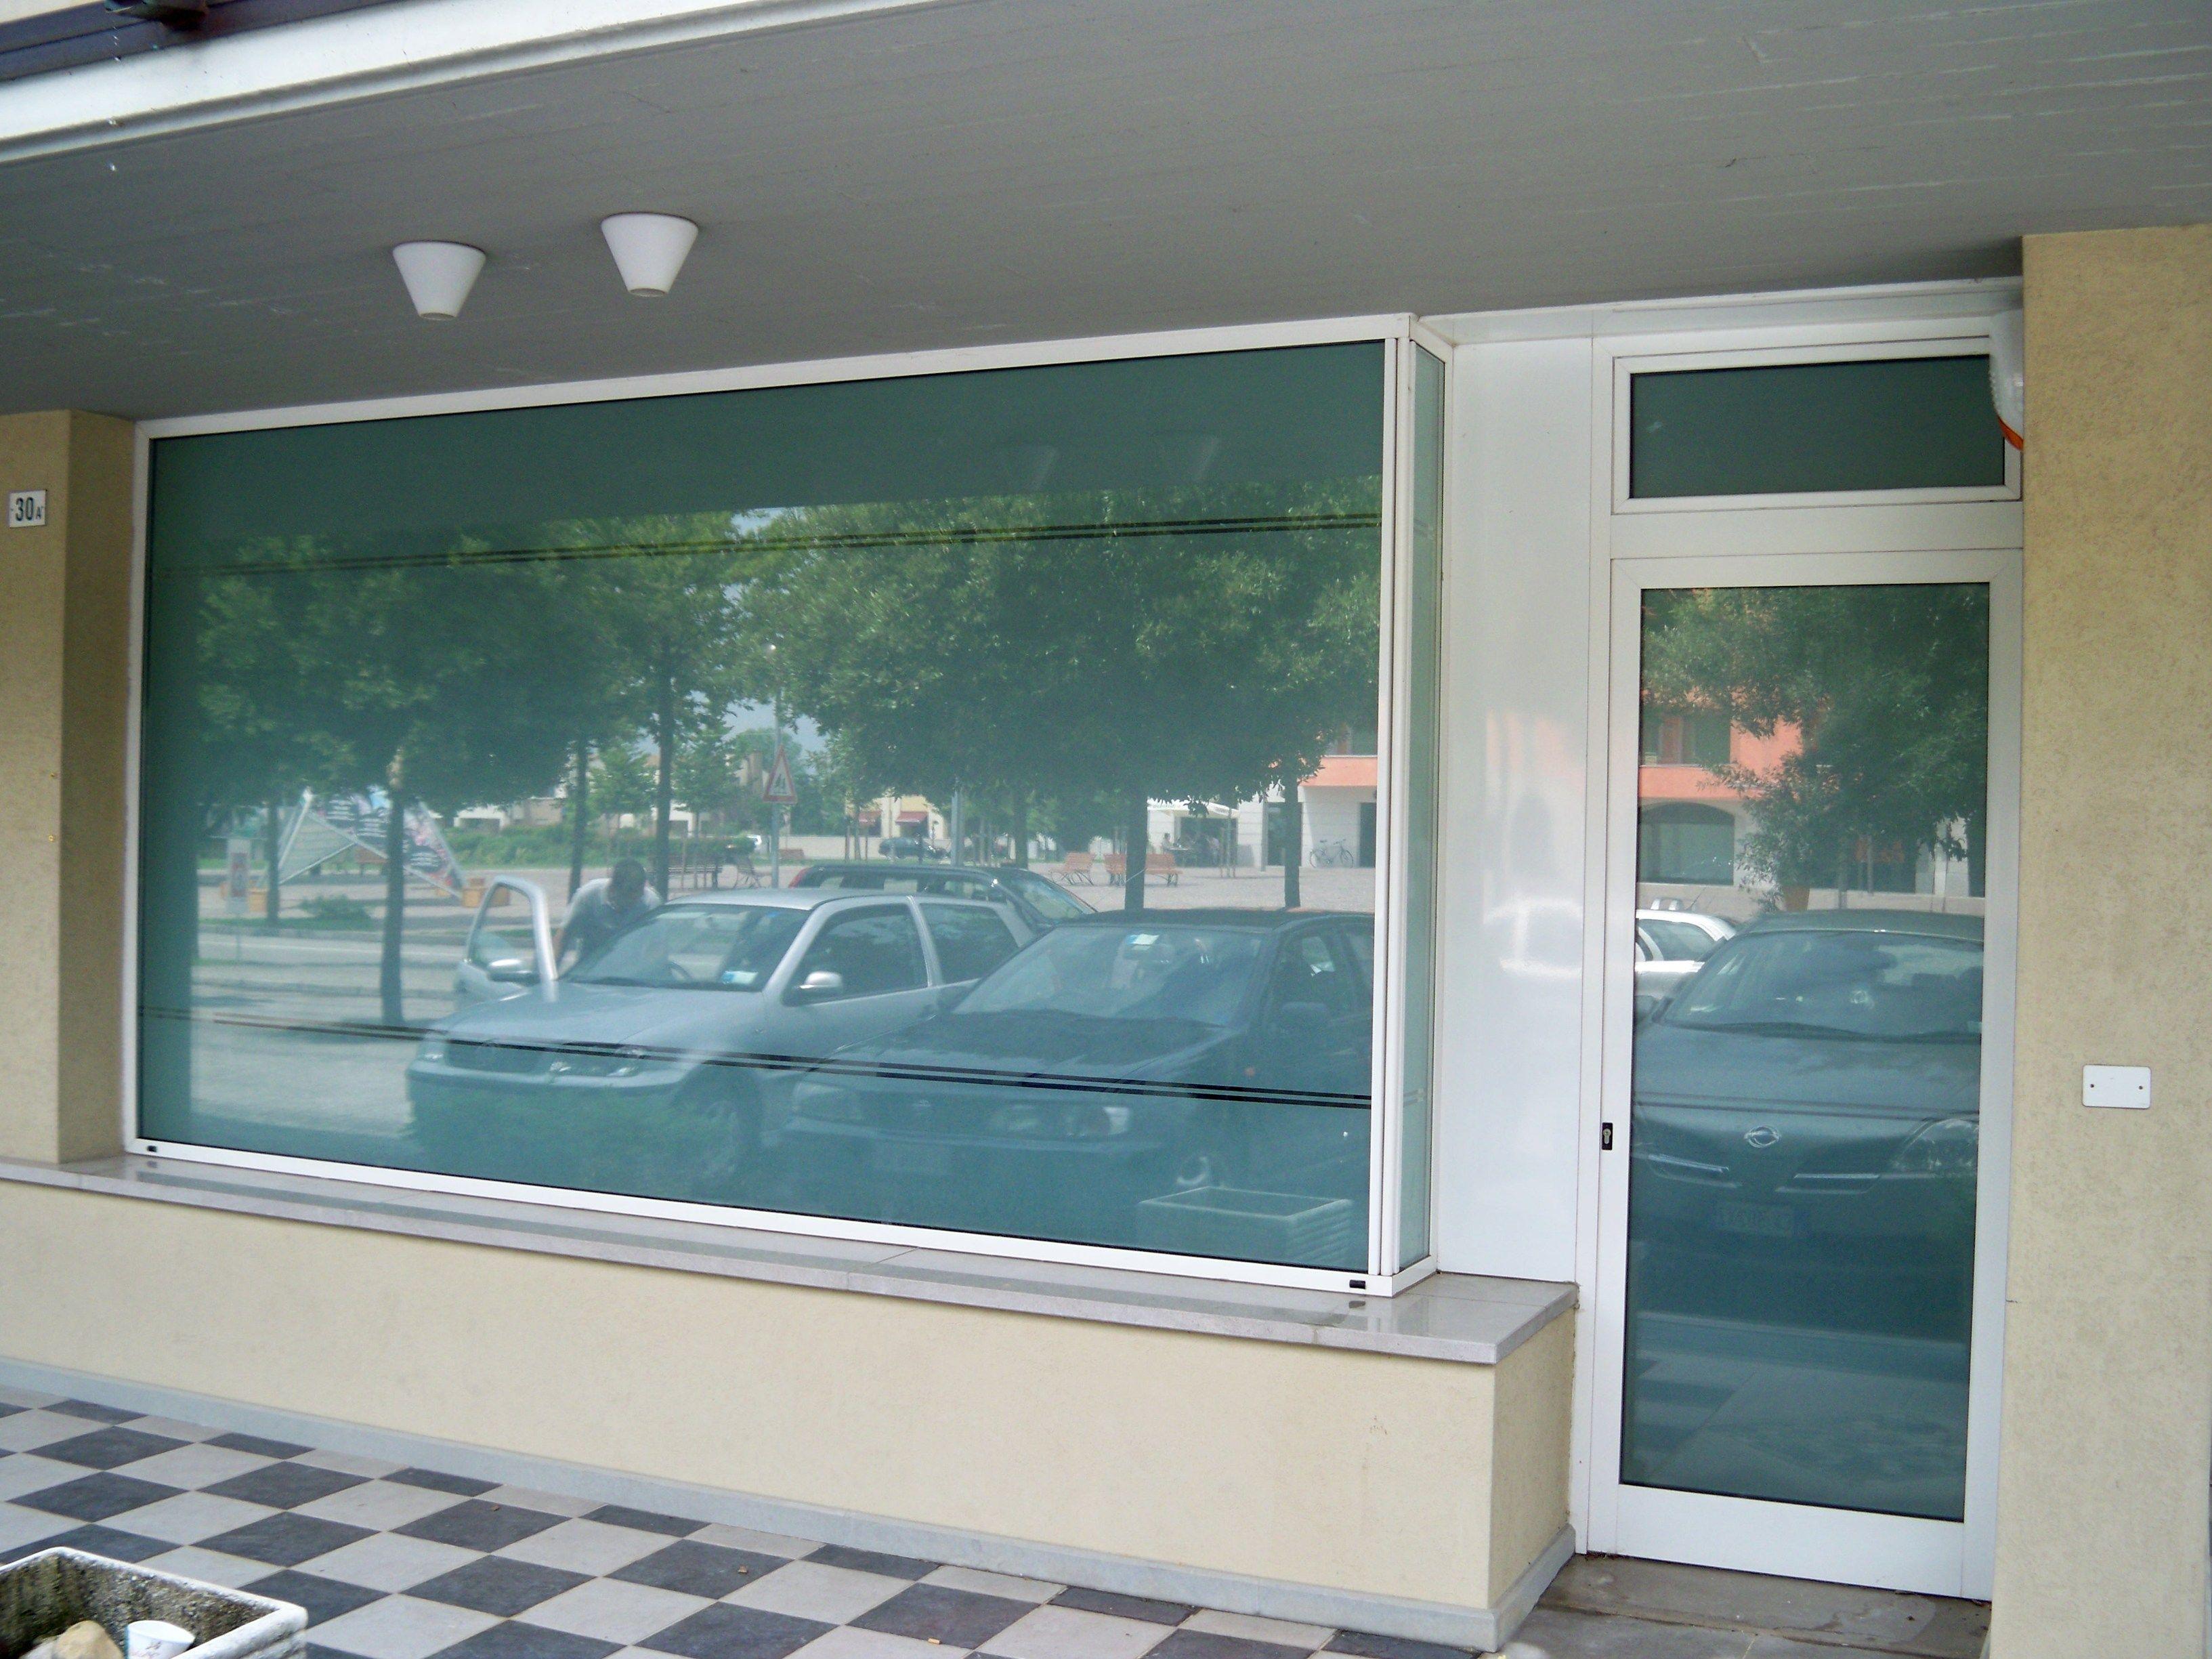 Pellicola per vetri decorativa pellicole traslucide opache by foster t c design hanita coatings - Pellicole per vetri casa ...